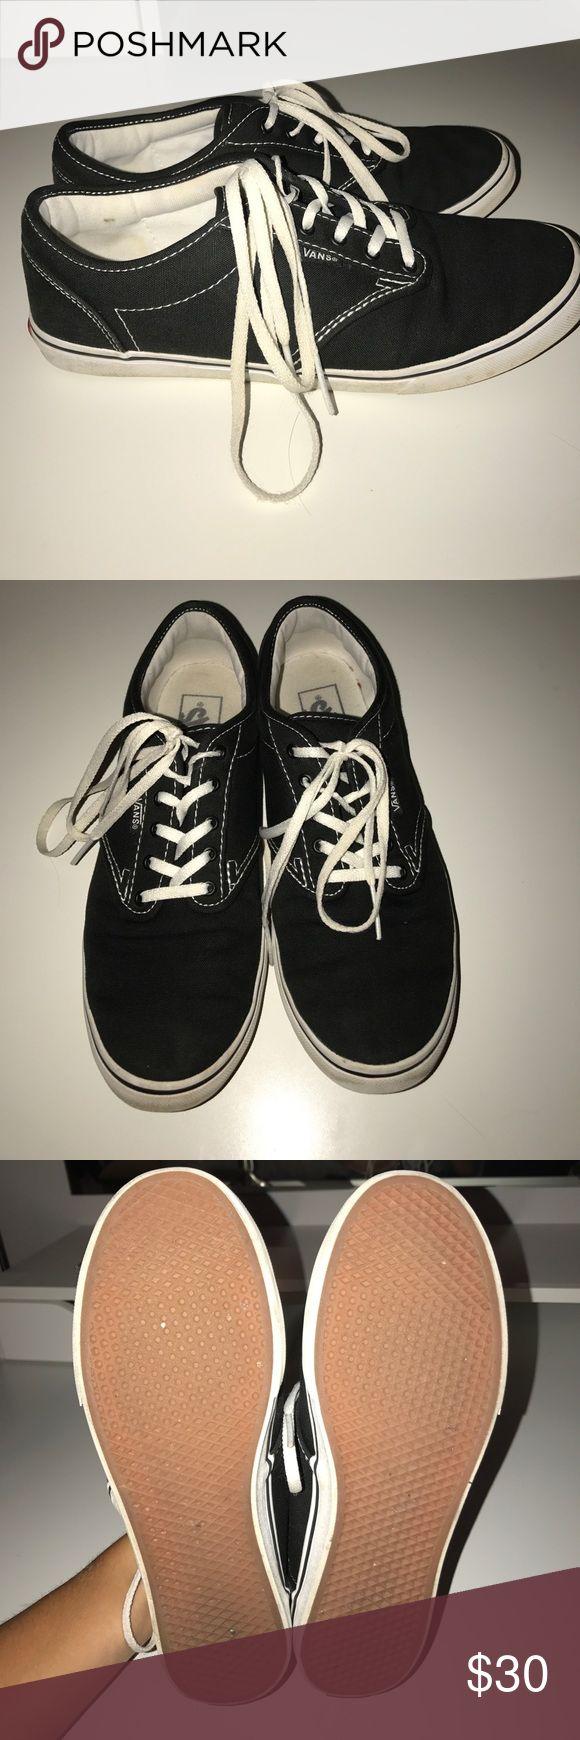 Women's black vans. Size 9. Used black vans. 8/10 condition. Vans Shoes Sneakers